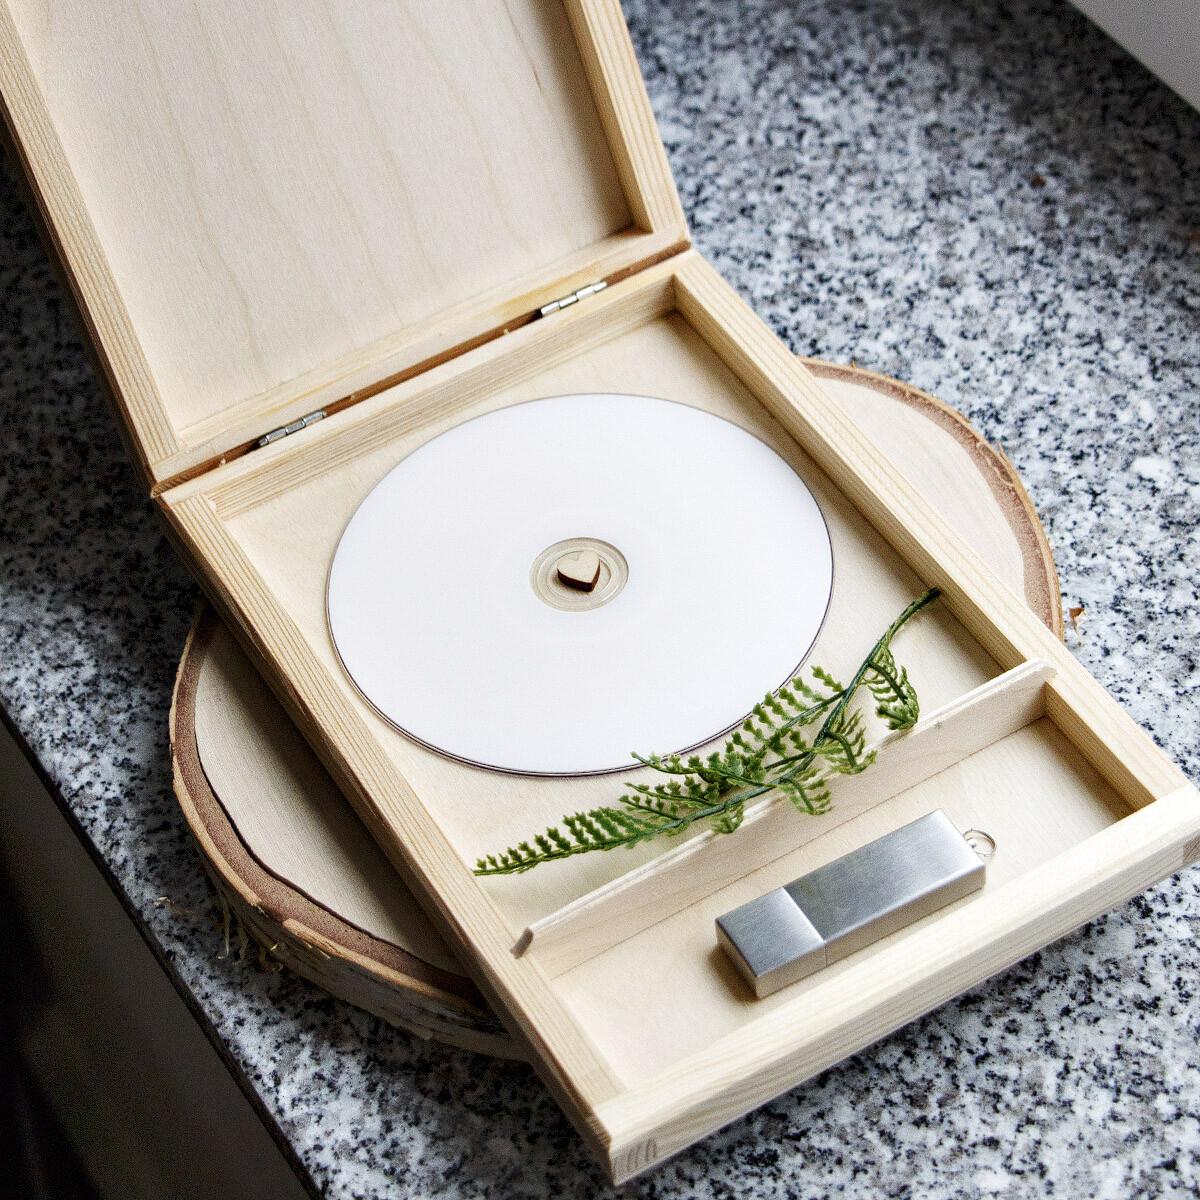 cd box 21 5 x 14 5 x 2 5 cm holzkiste 2 f cher. Black Bedroom Furniture Sets. Home Design Ideas